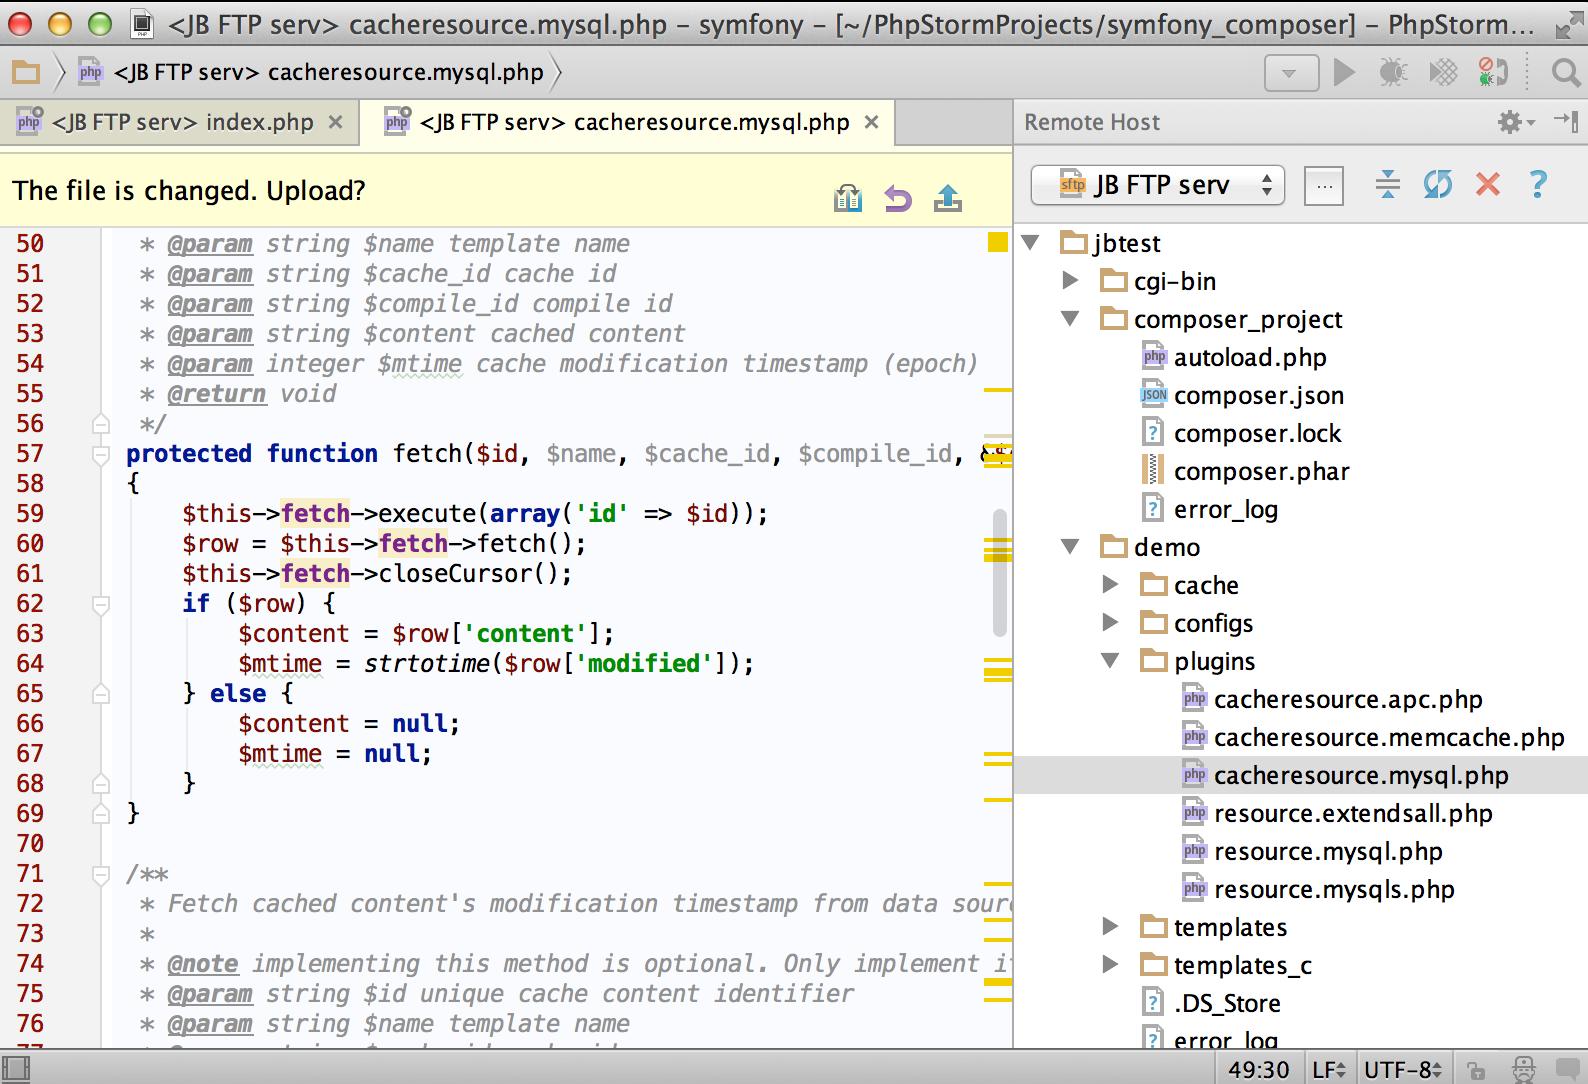 phpstorm_remote_edit